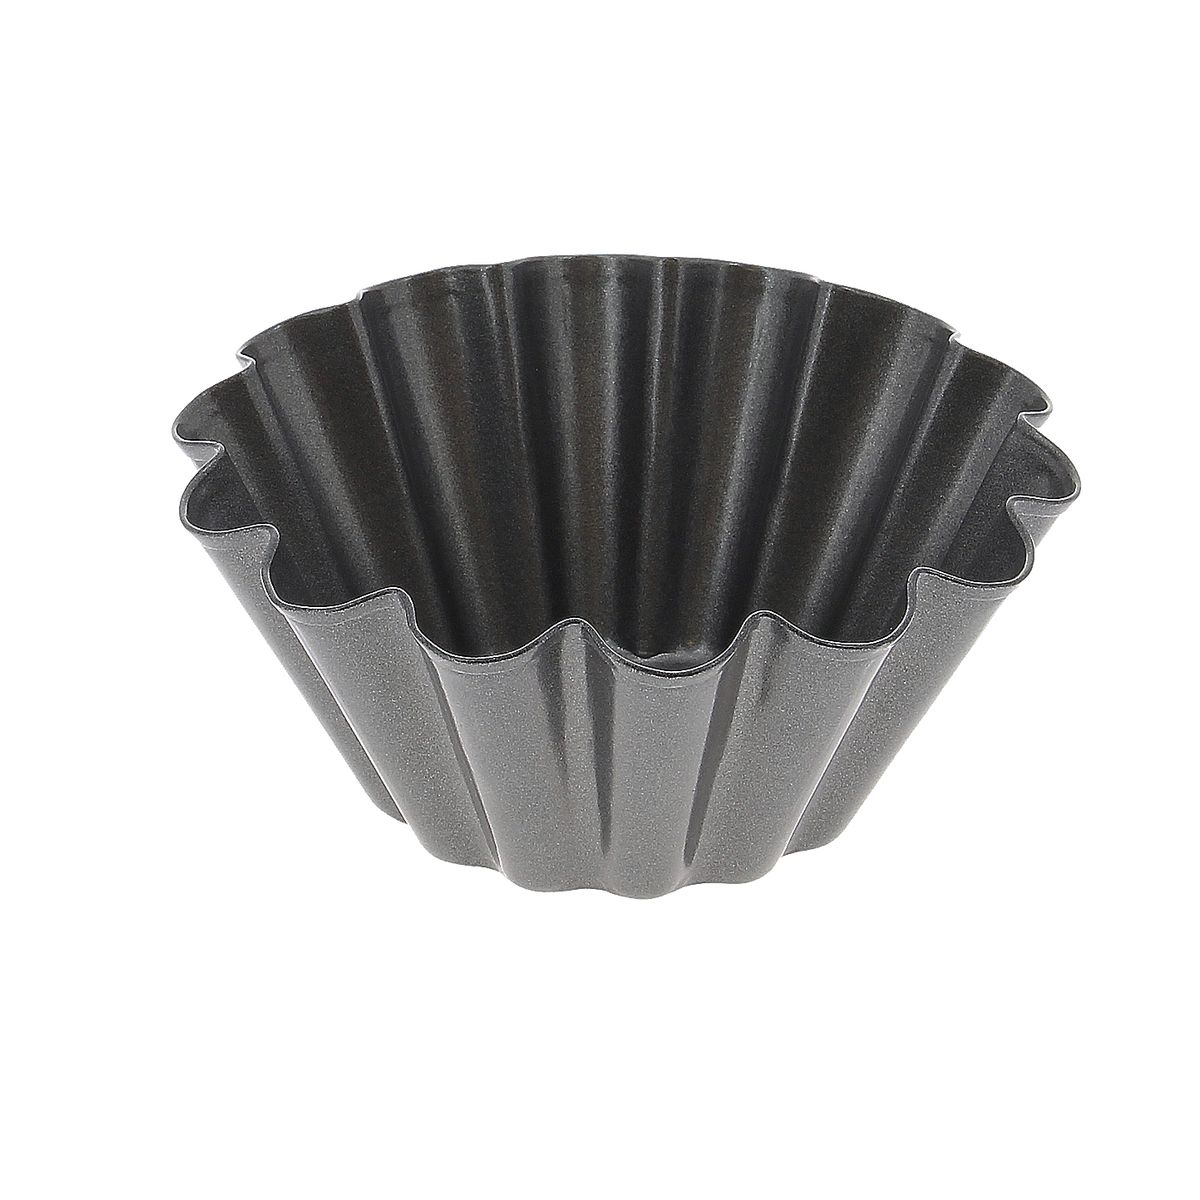 Moule mini-brioches anti-adhesif 10 cm - De Buyer